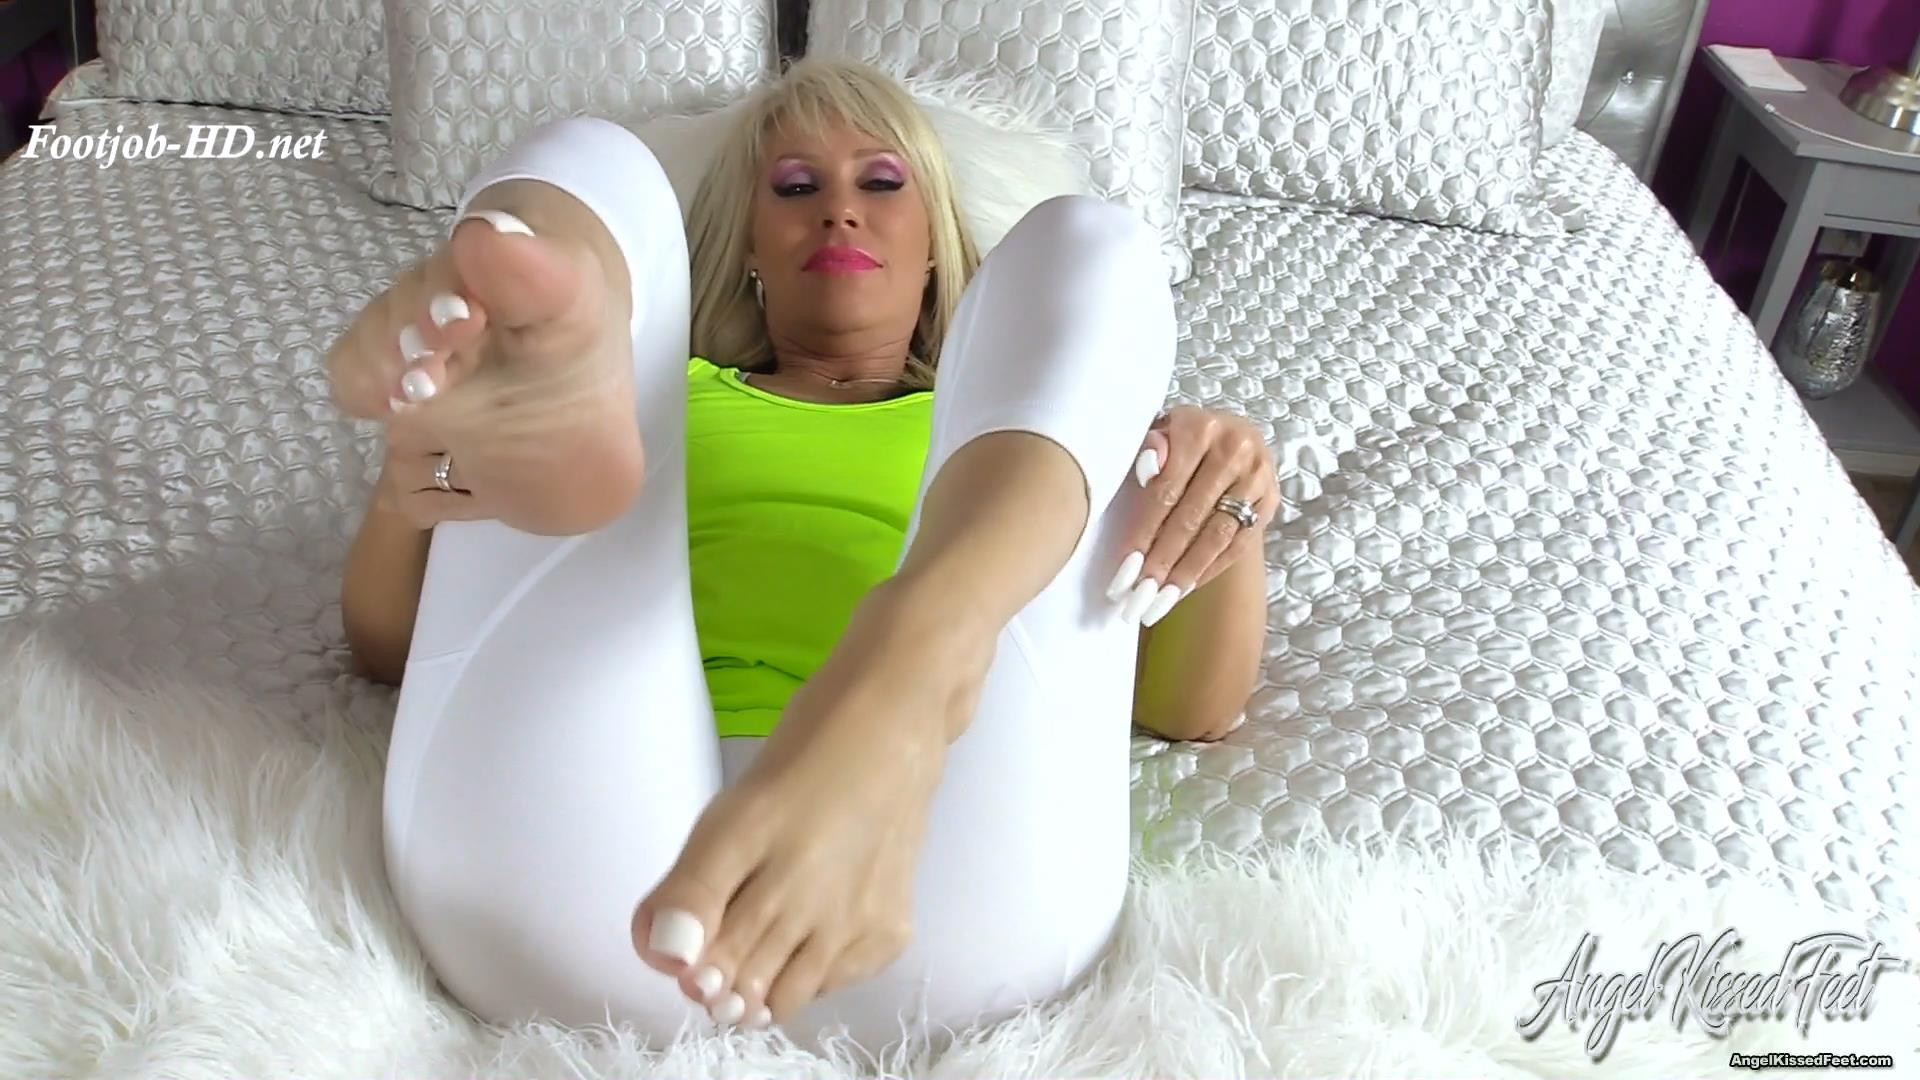 What_If_Your_Mom_Walks_In_-_Erotic_Nikki.jpg